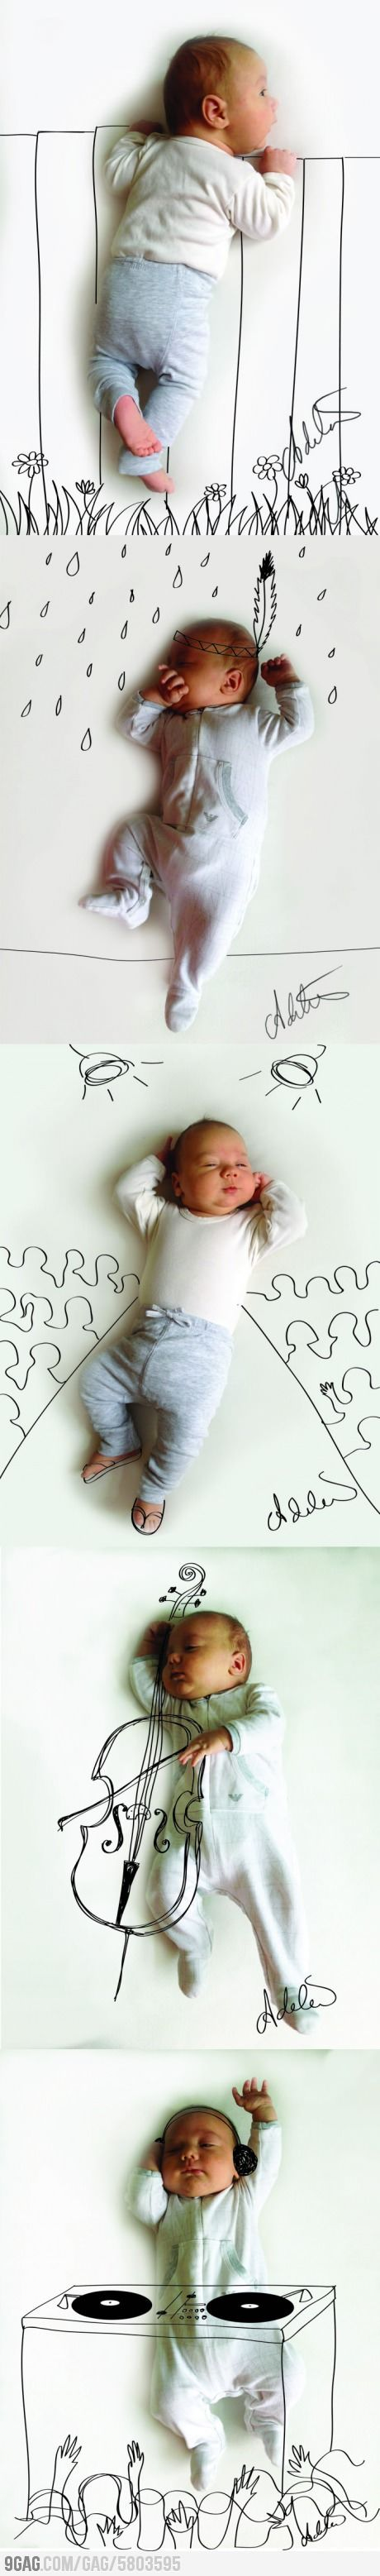 When My Baby Dreams by Adele Enersen